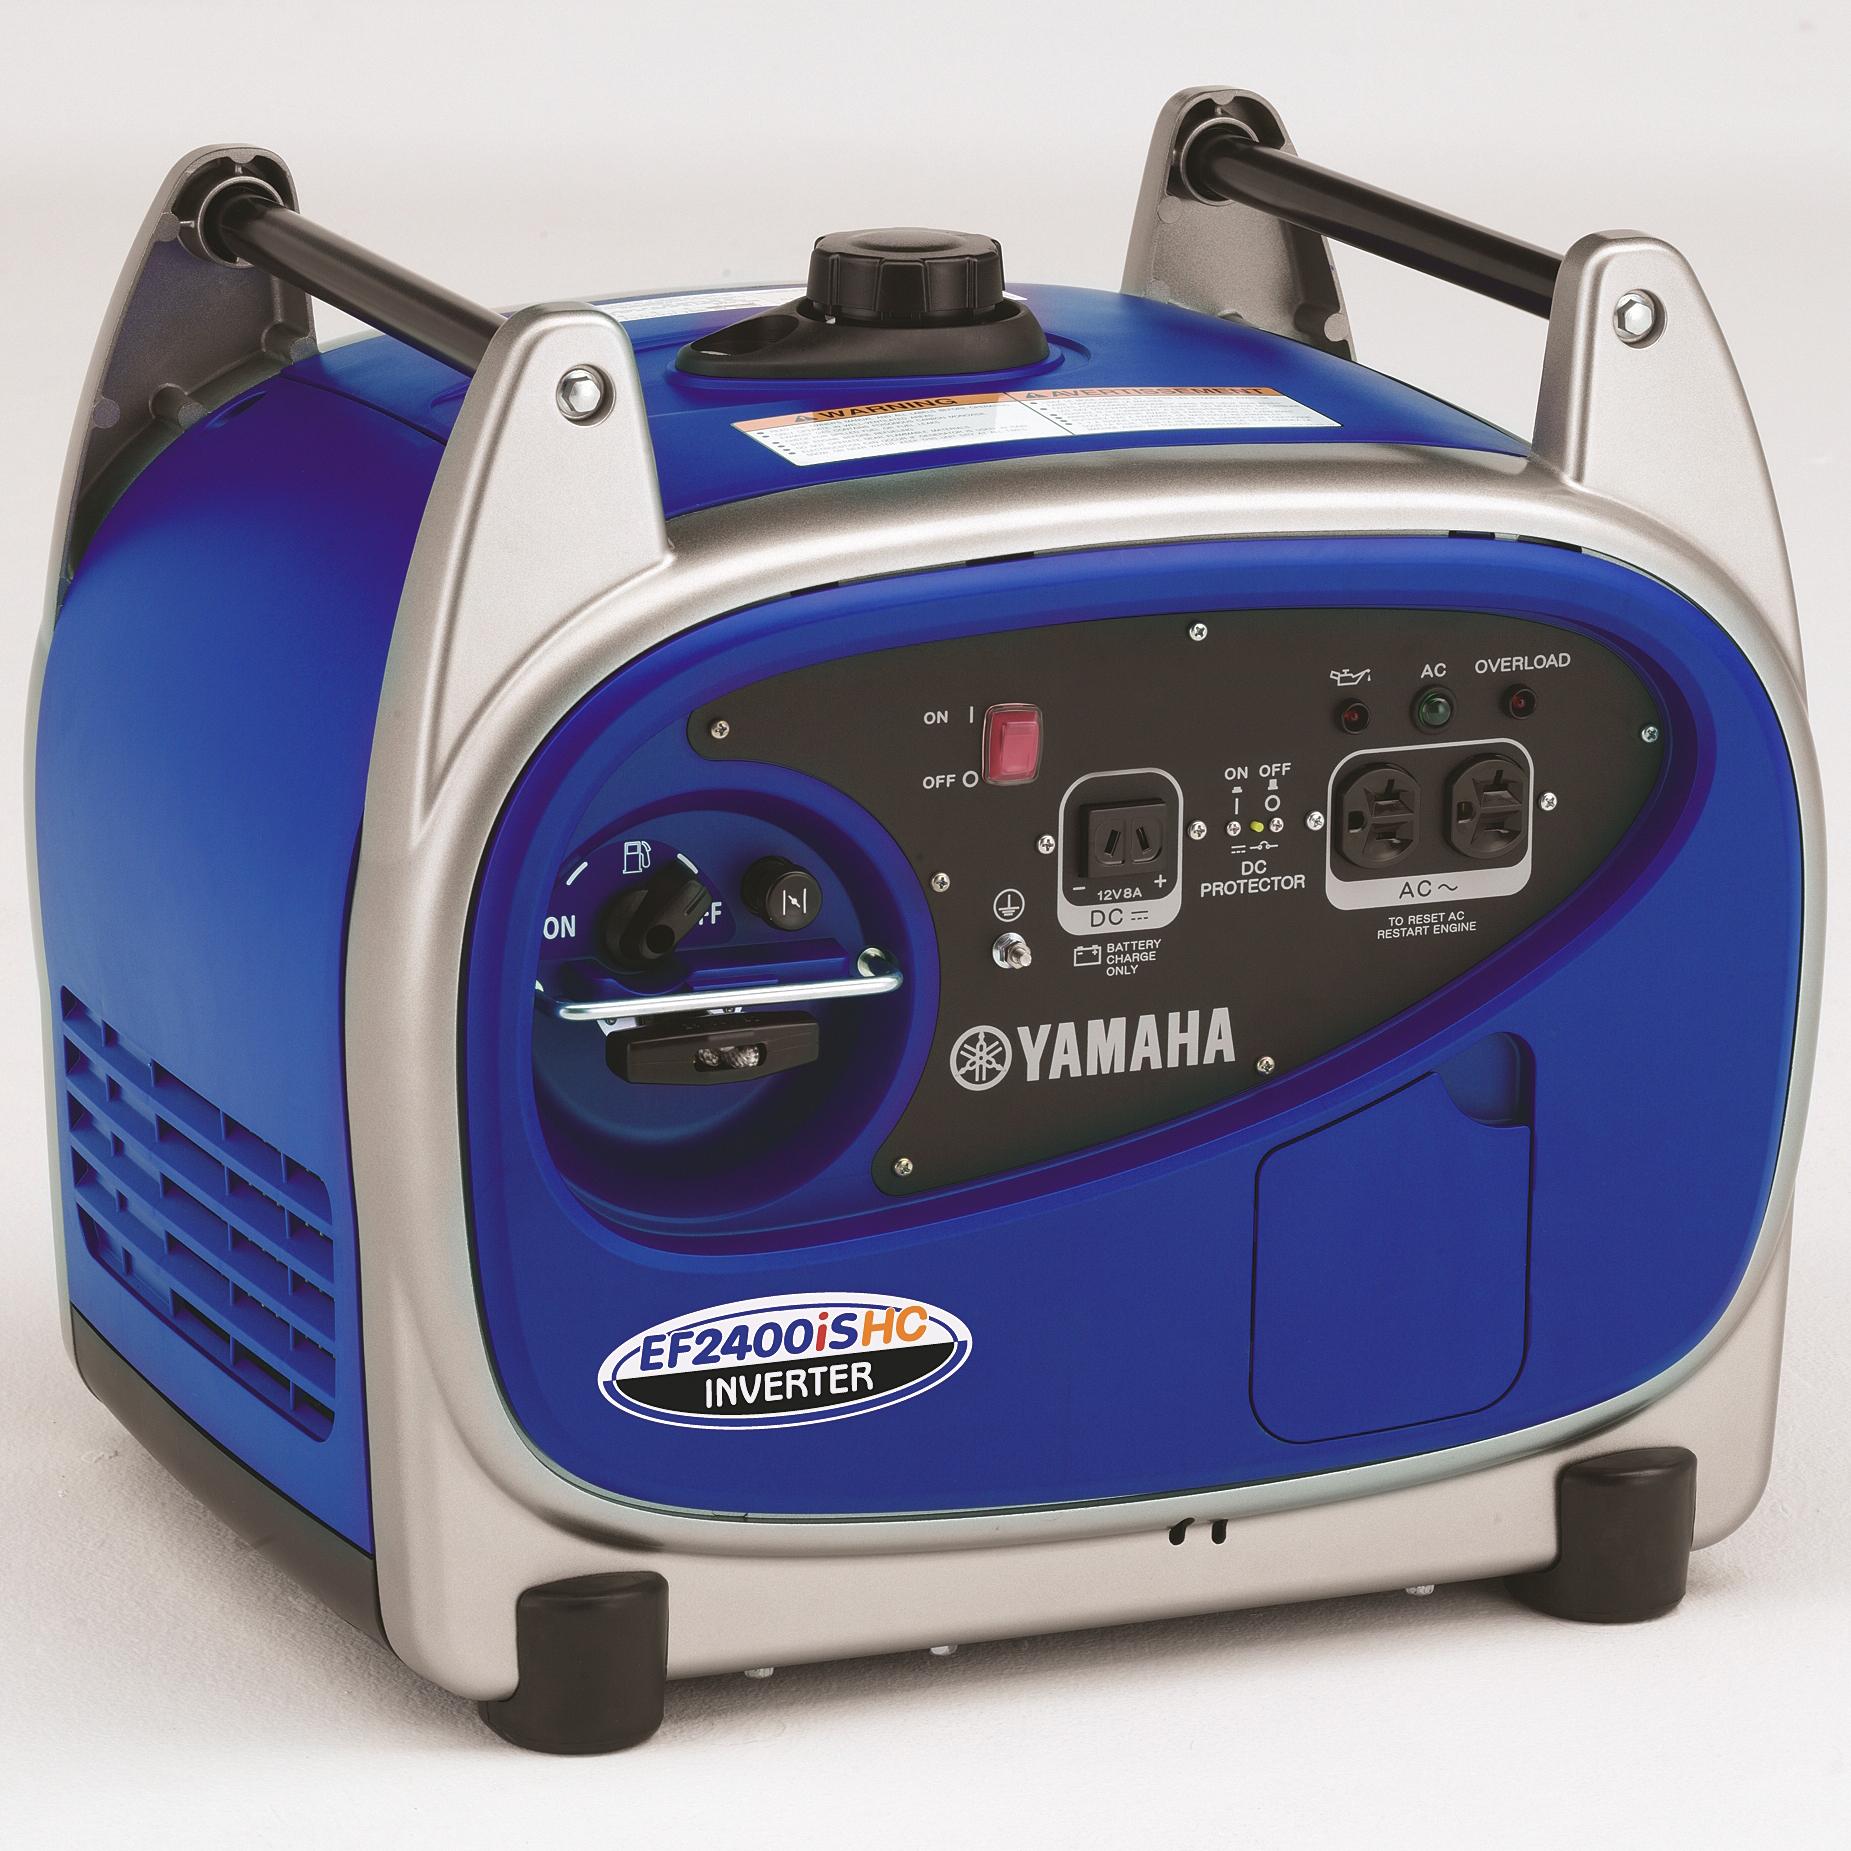 Portable Generators Explained